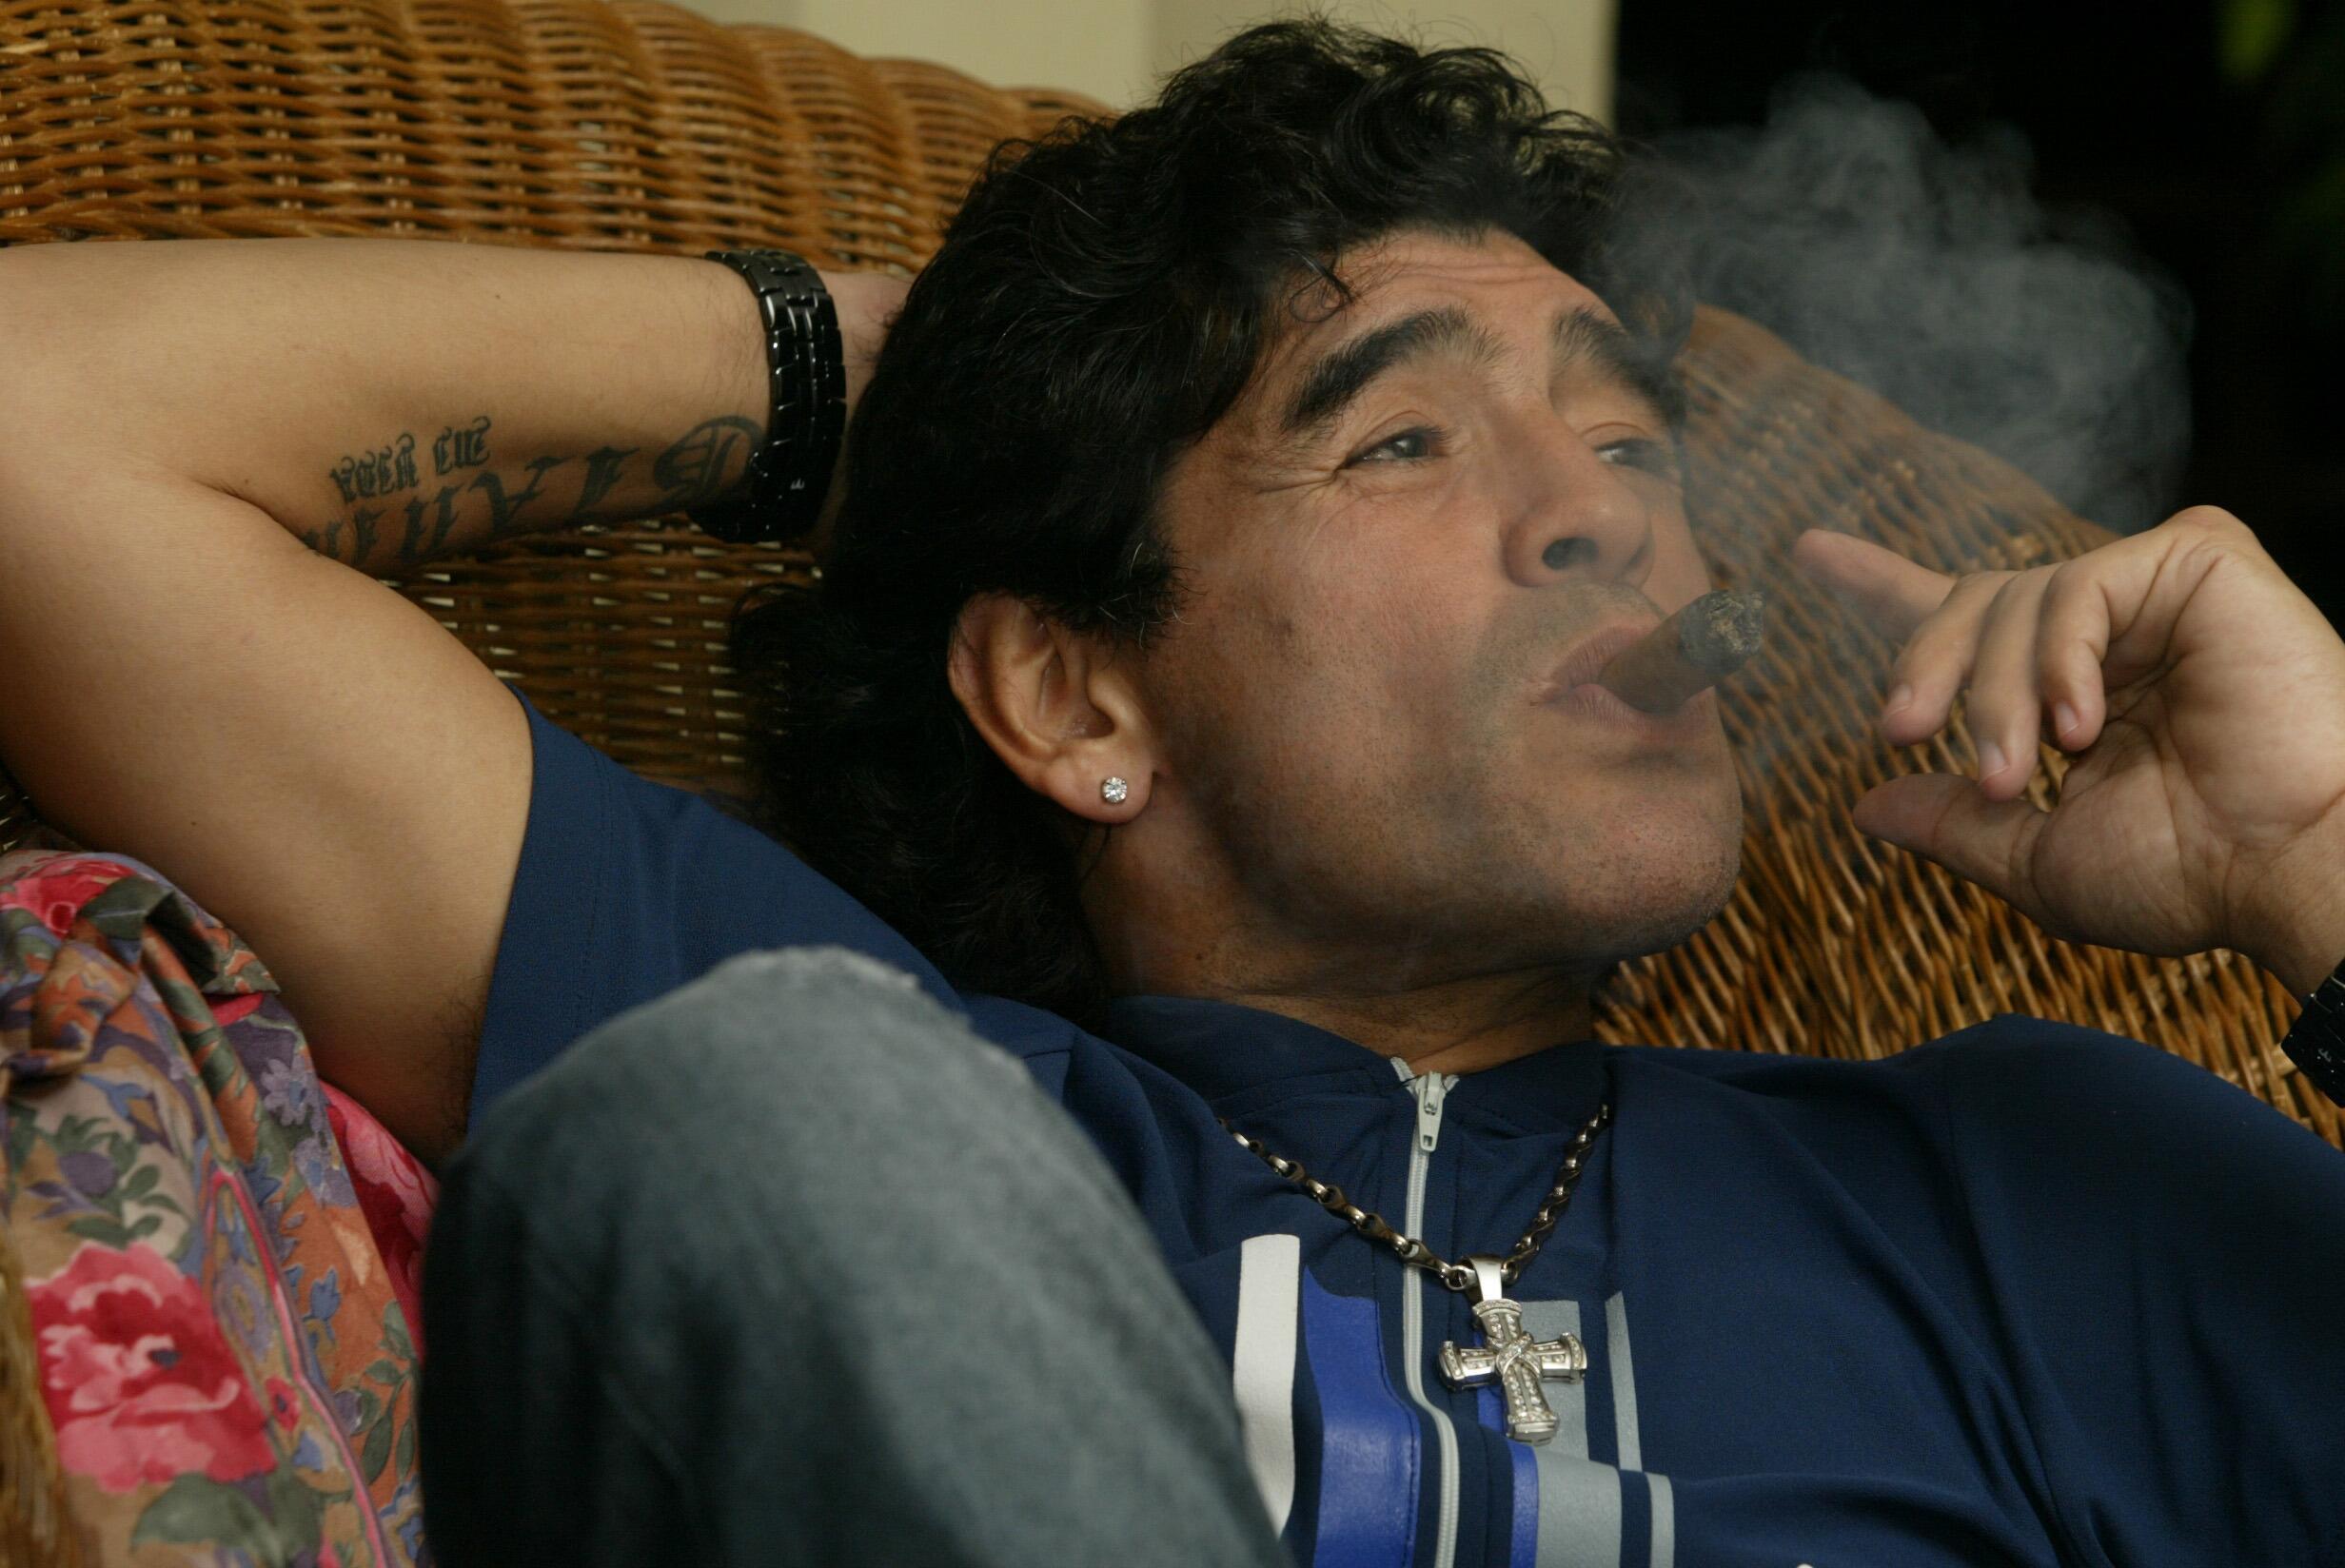 Bild zu Diego Maradona, Kuba, Havana, Zigarre, Rauchen, TV, Fernsehen